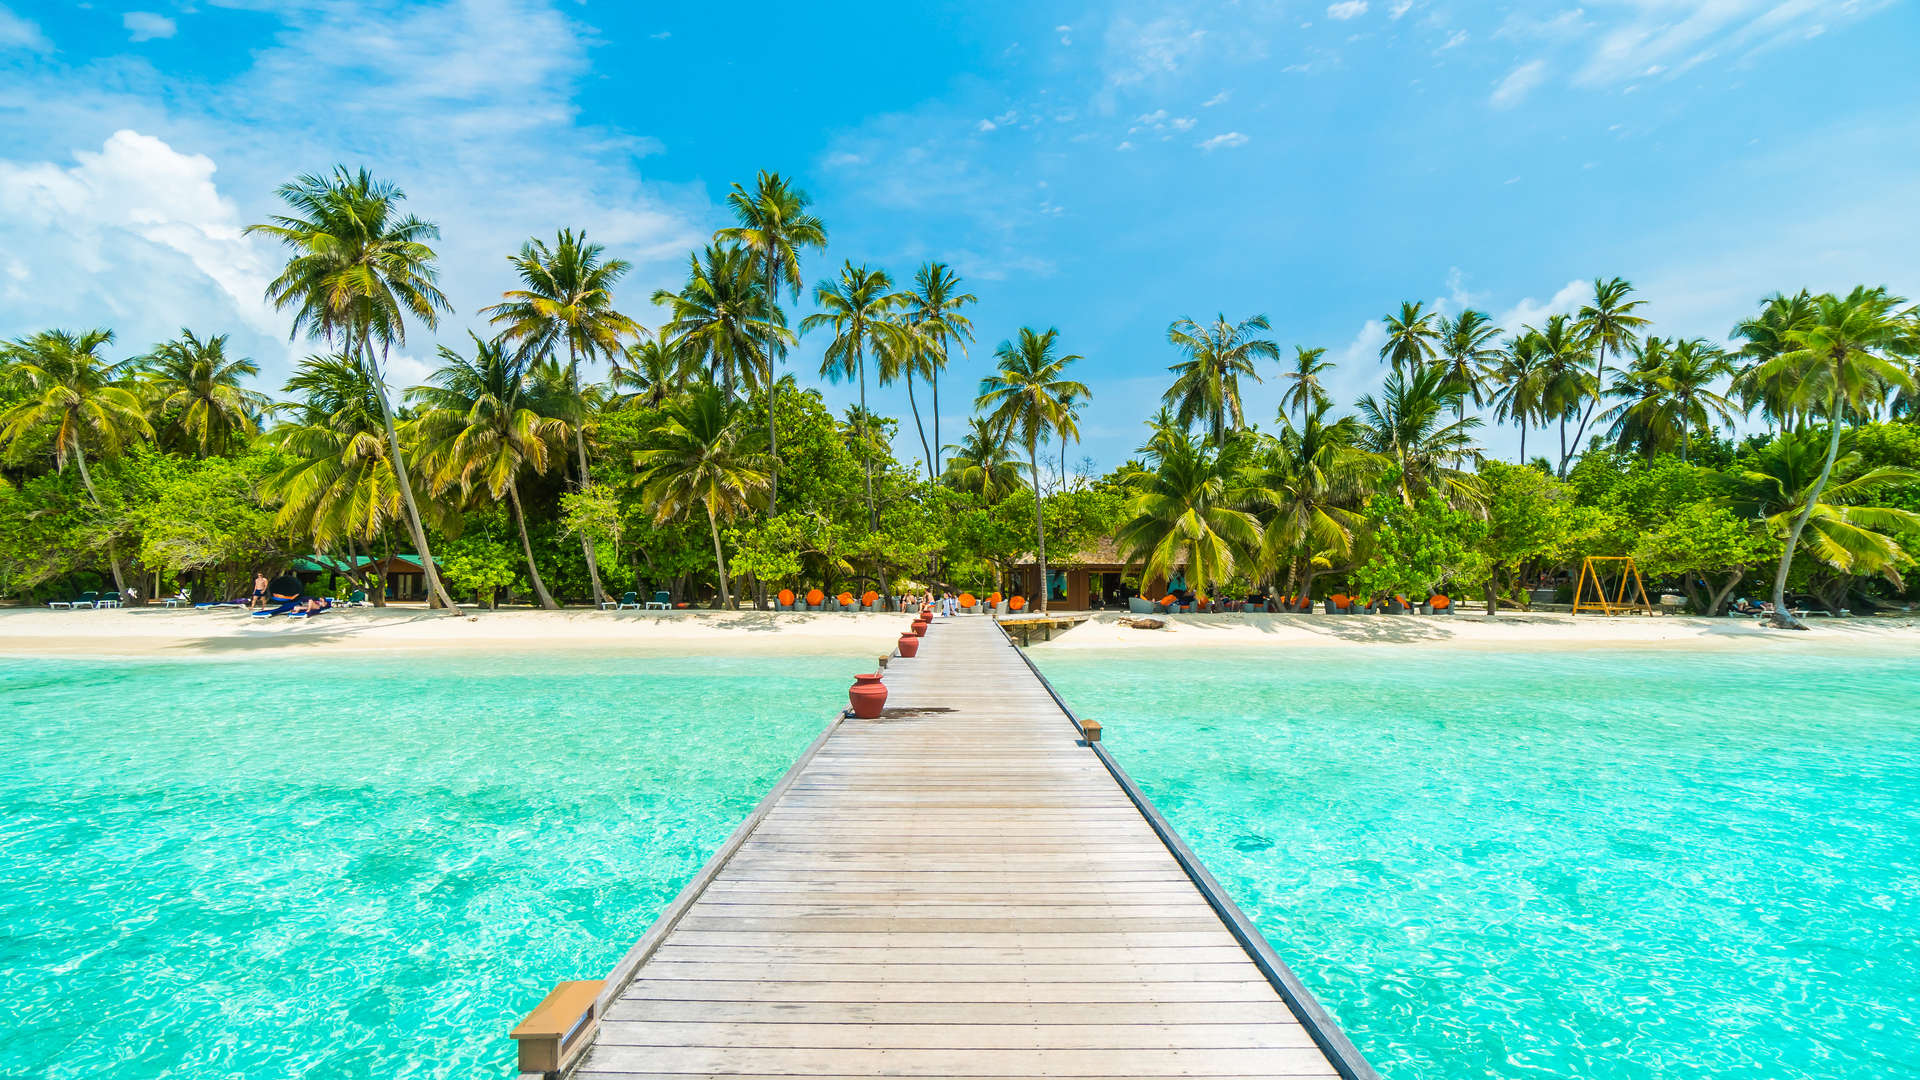 Malediven | ©Stockforlife/Shutterstock.com